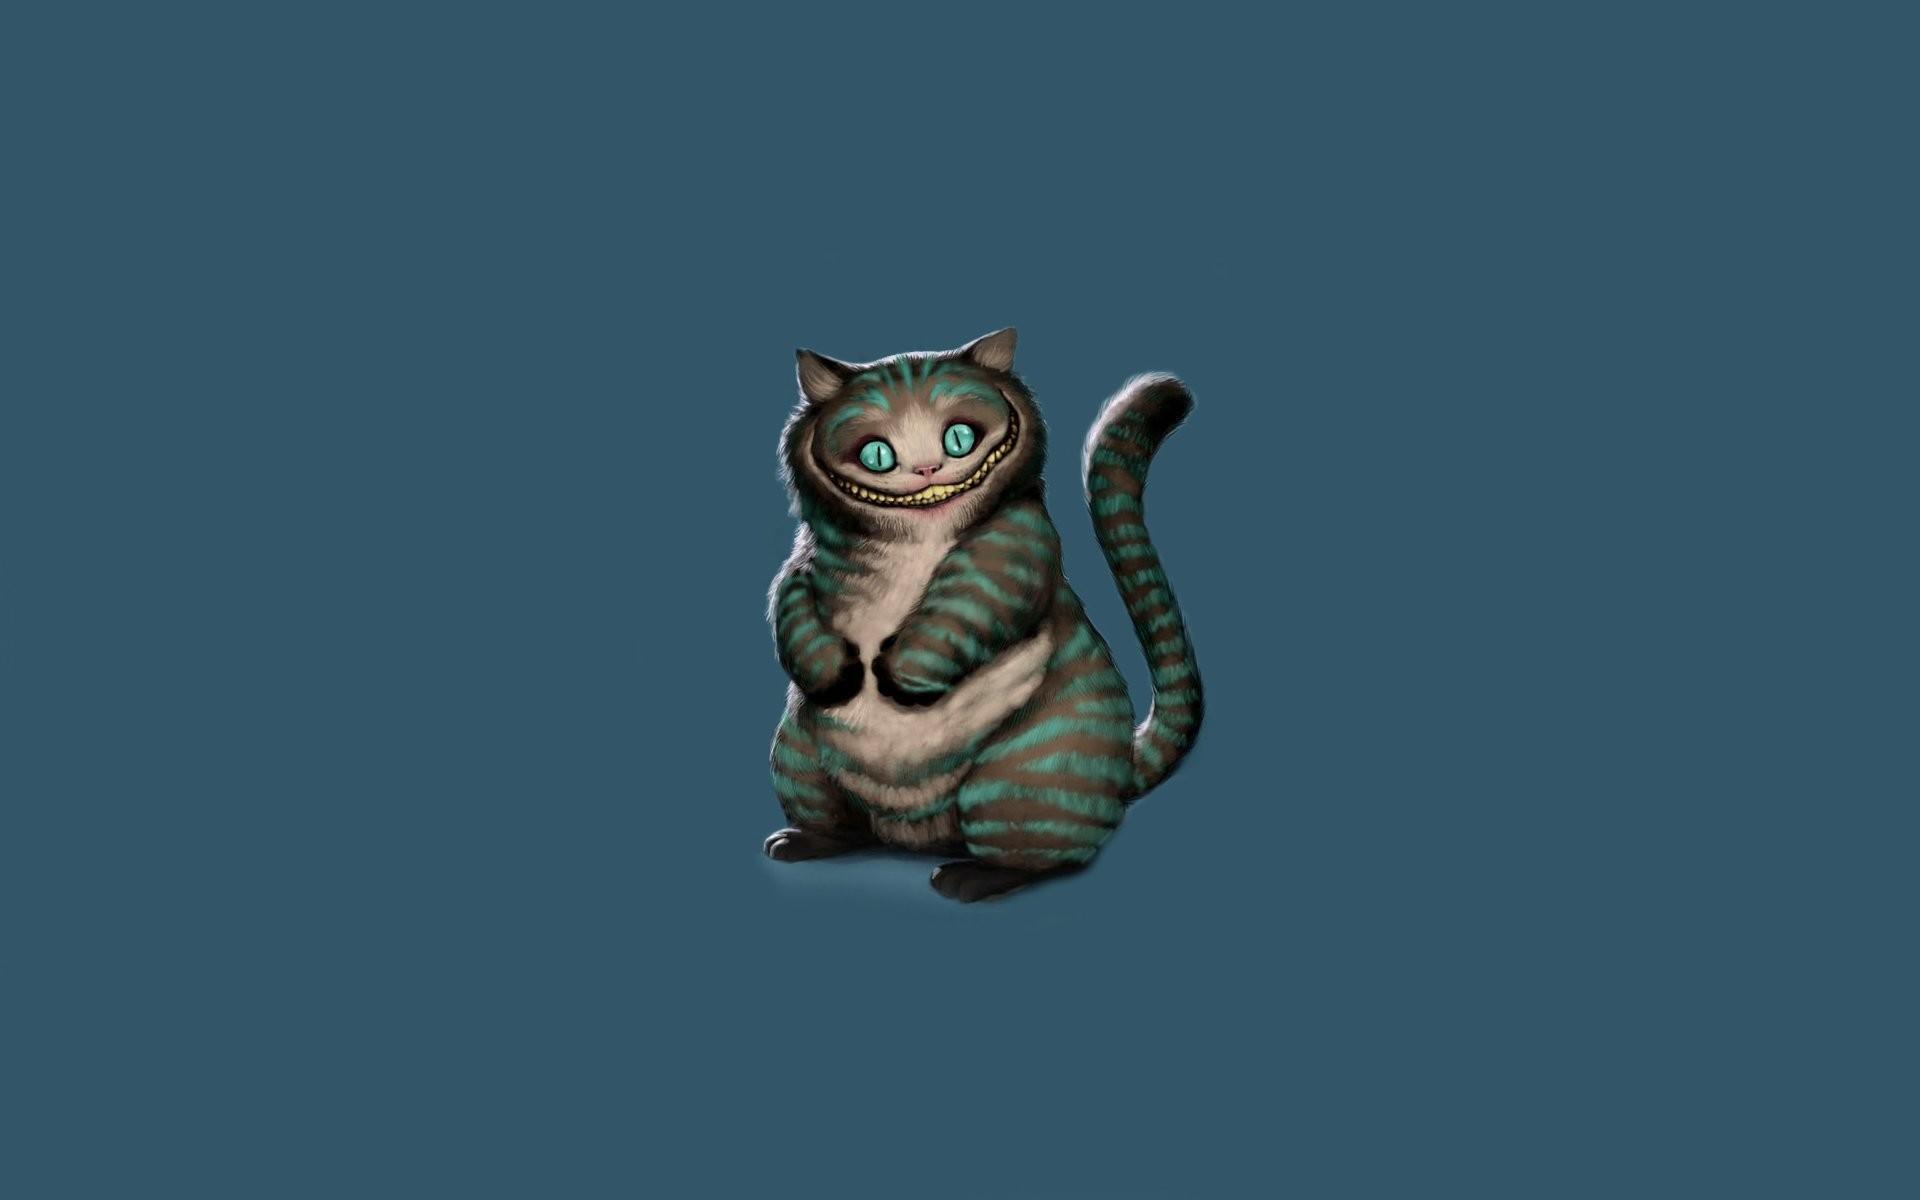 cheshire cat cheshire cat sitting alice in wonderland alice's adventures in  wonderland art minimalism blue background